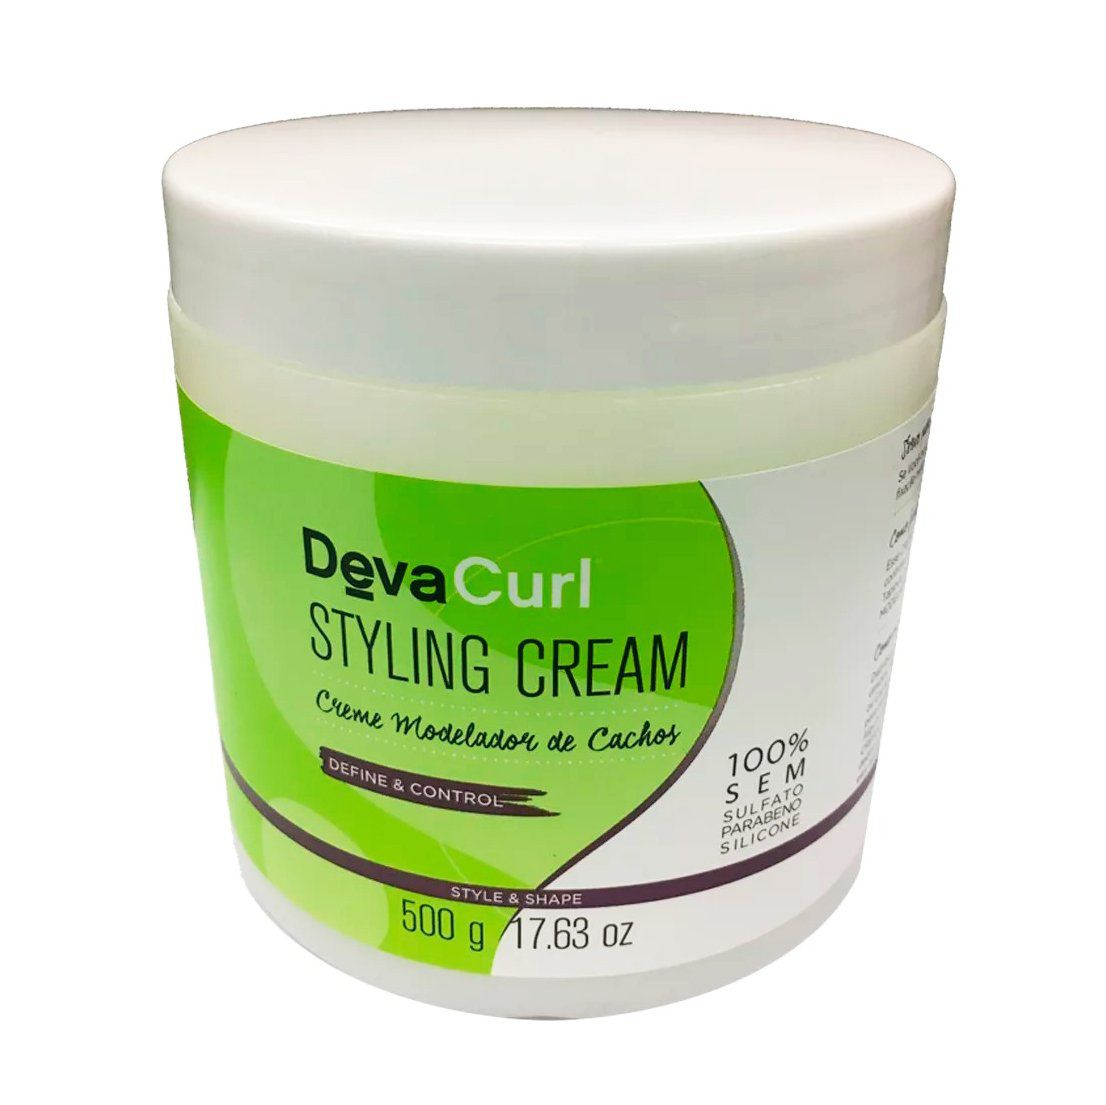 Deva Curl - Styling Cream Creme Modelador de Cachos 500g